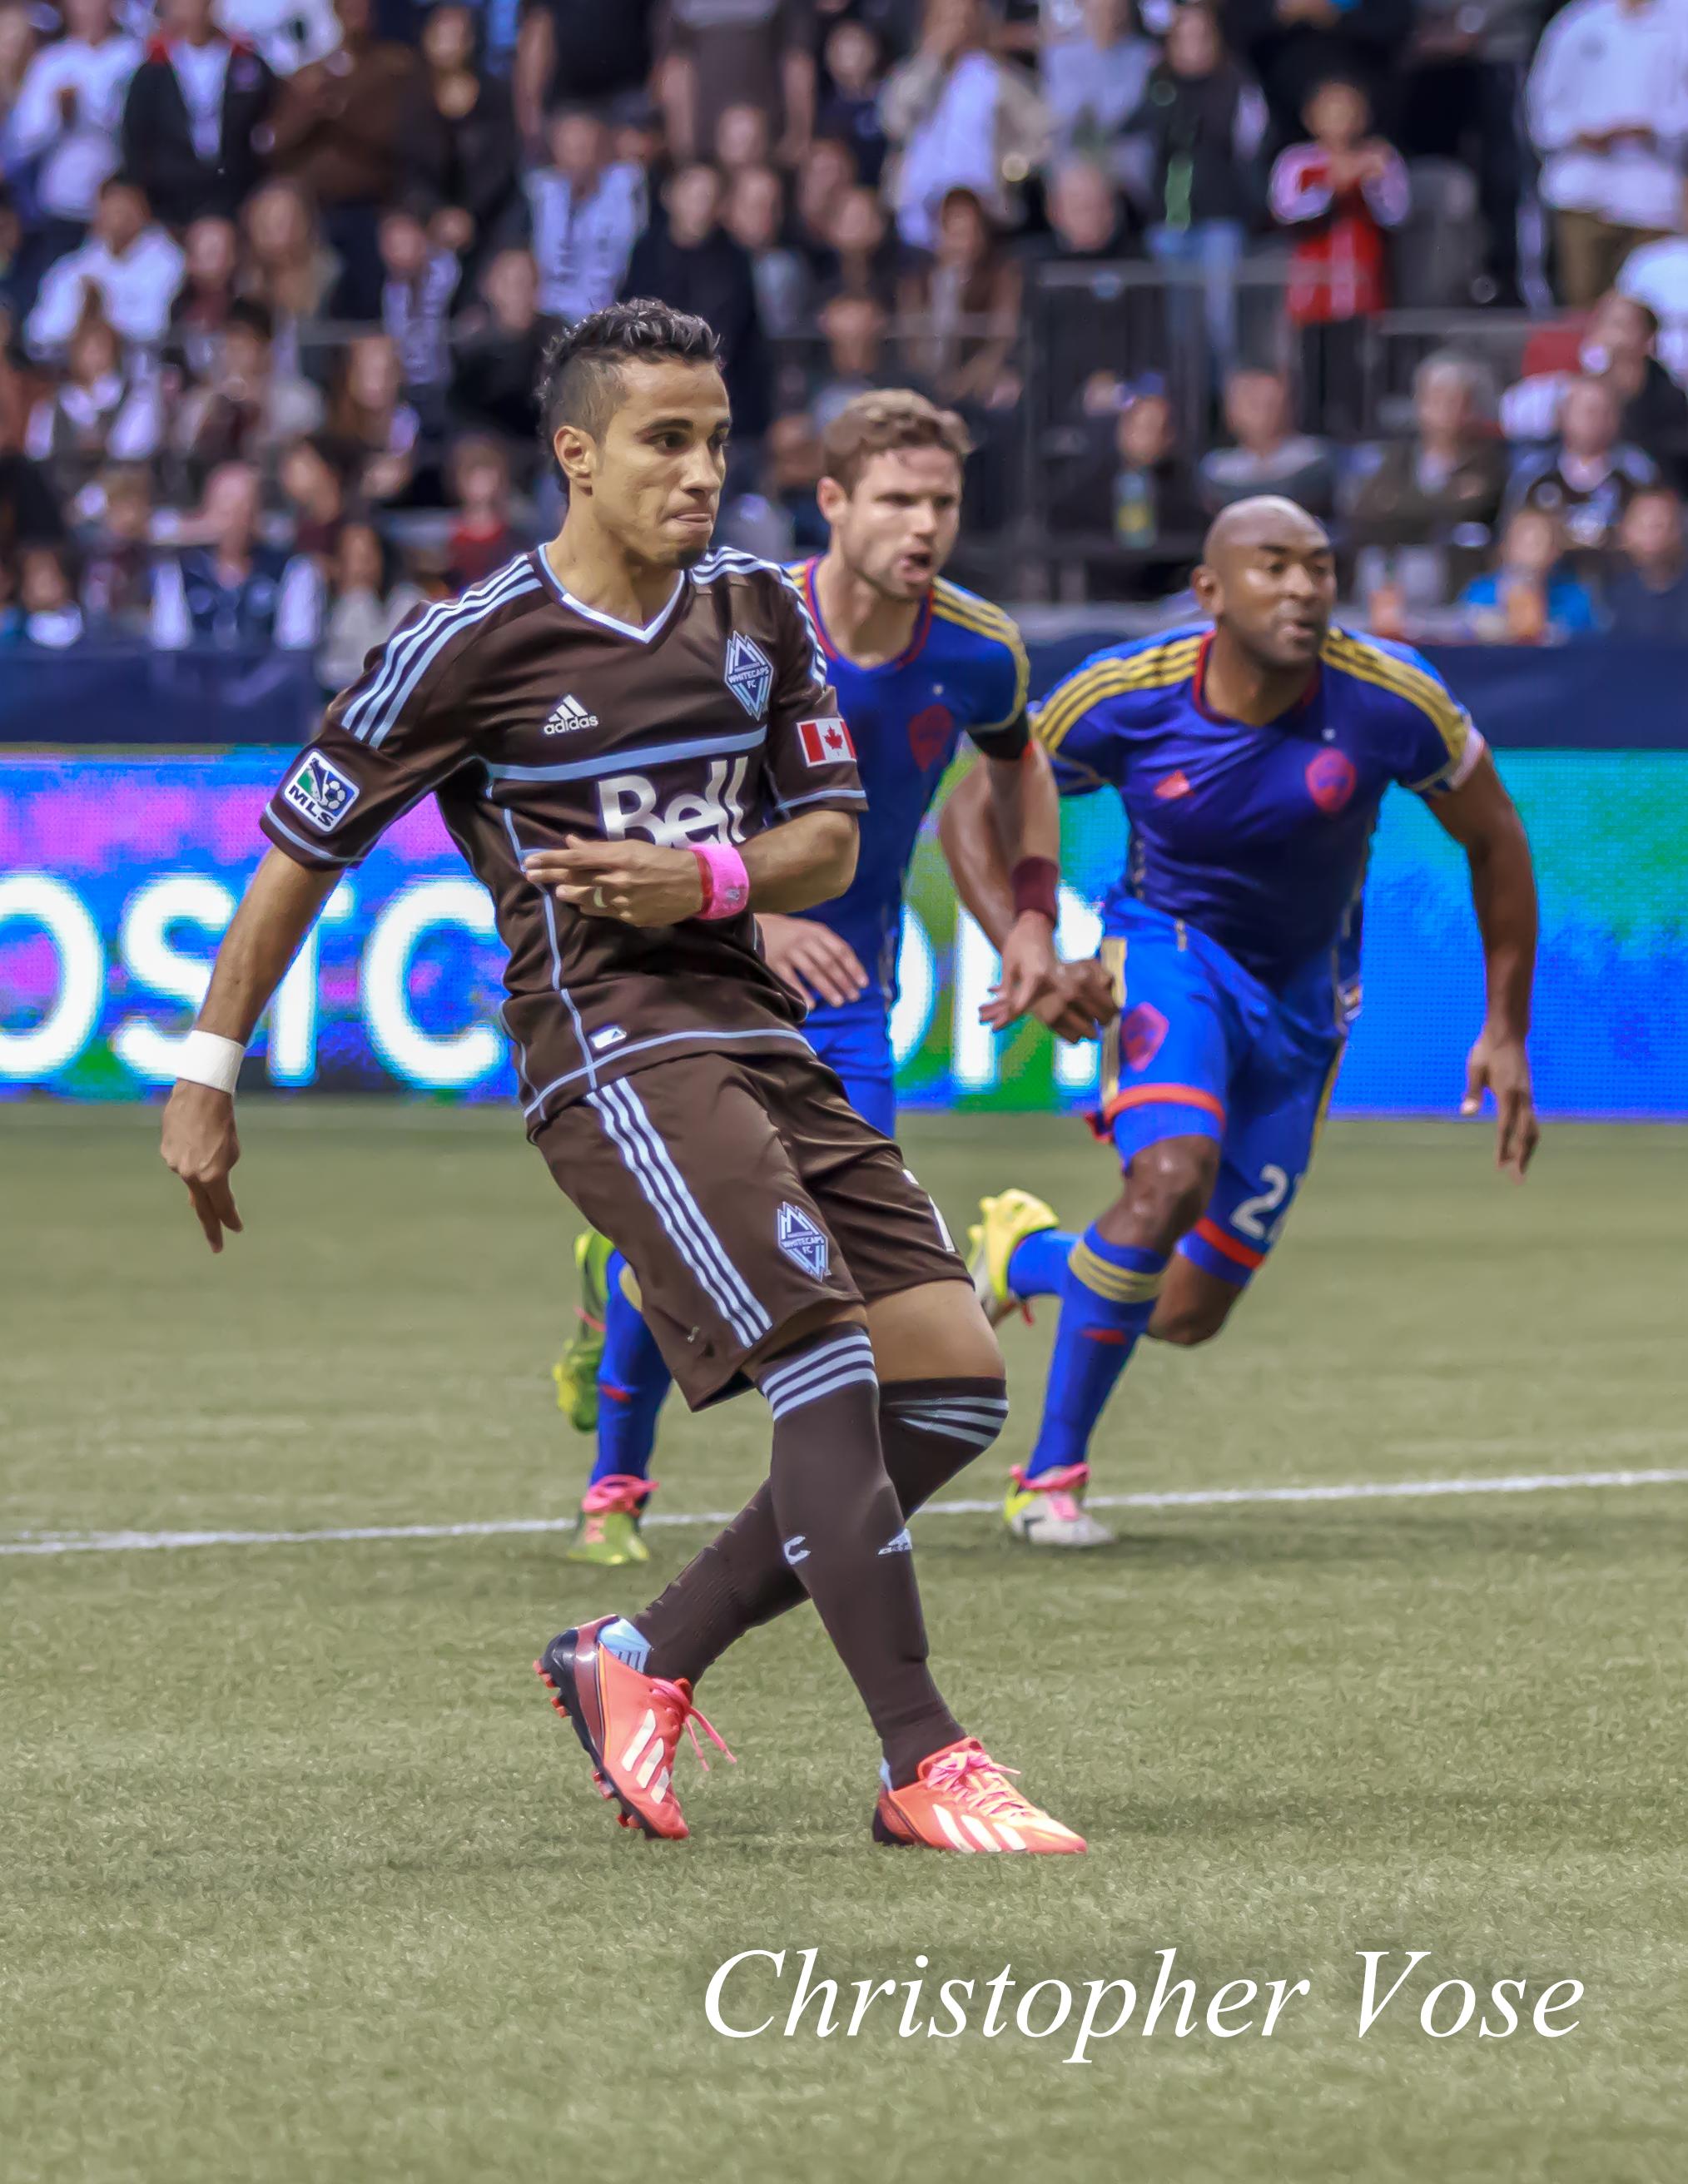 2013-10-27 Camilo Sanvezzo's First Goal (Penalty Kick).jpg